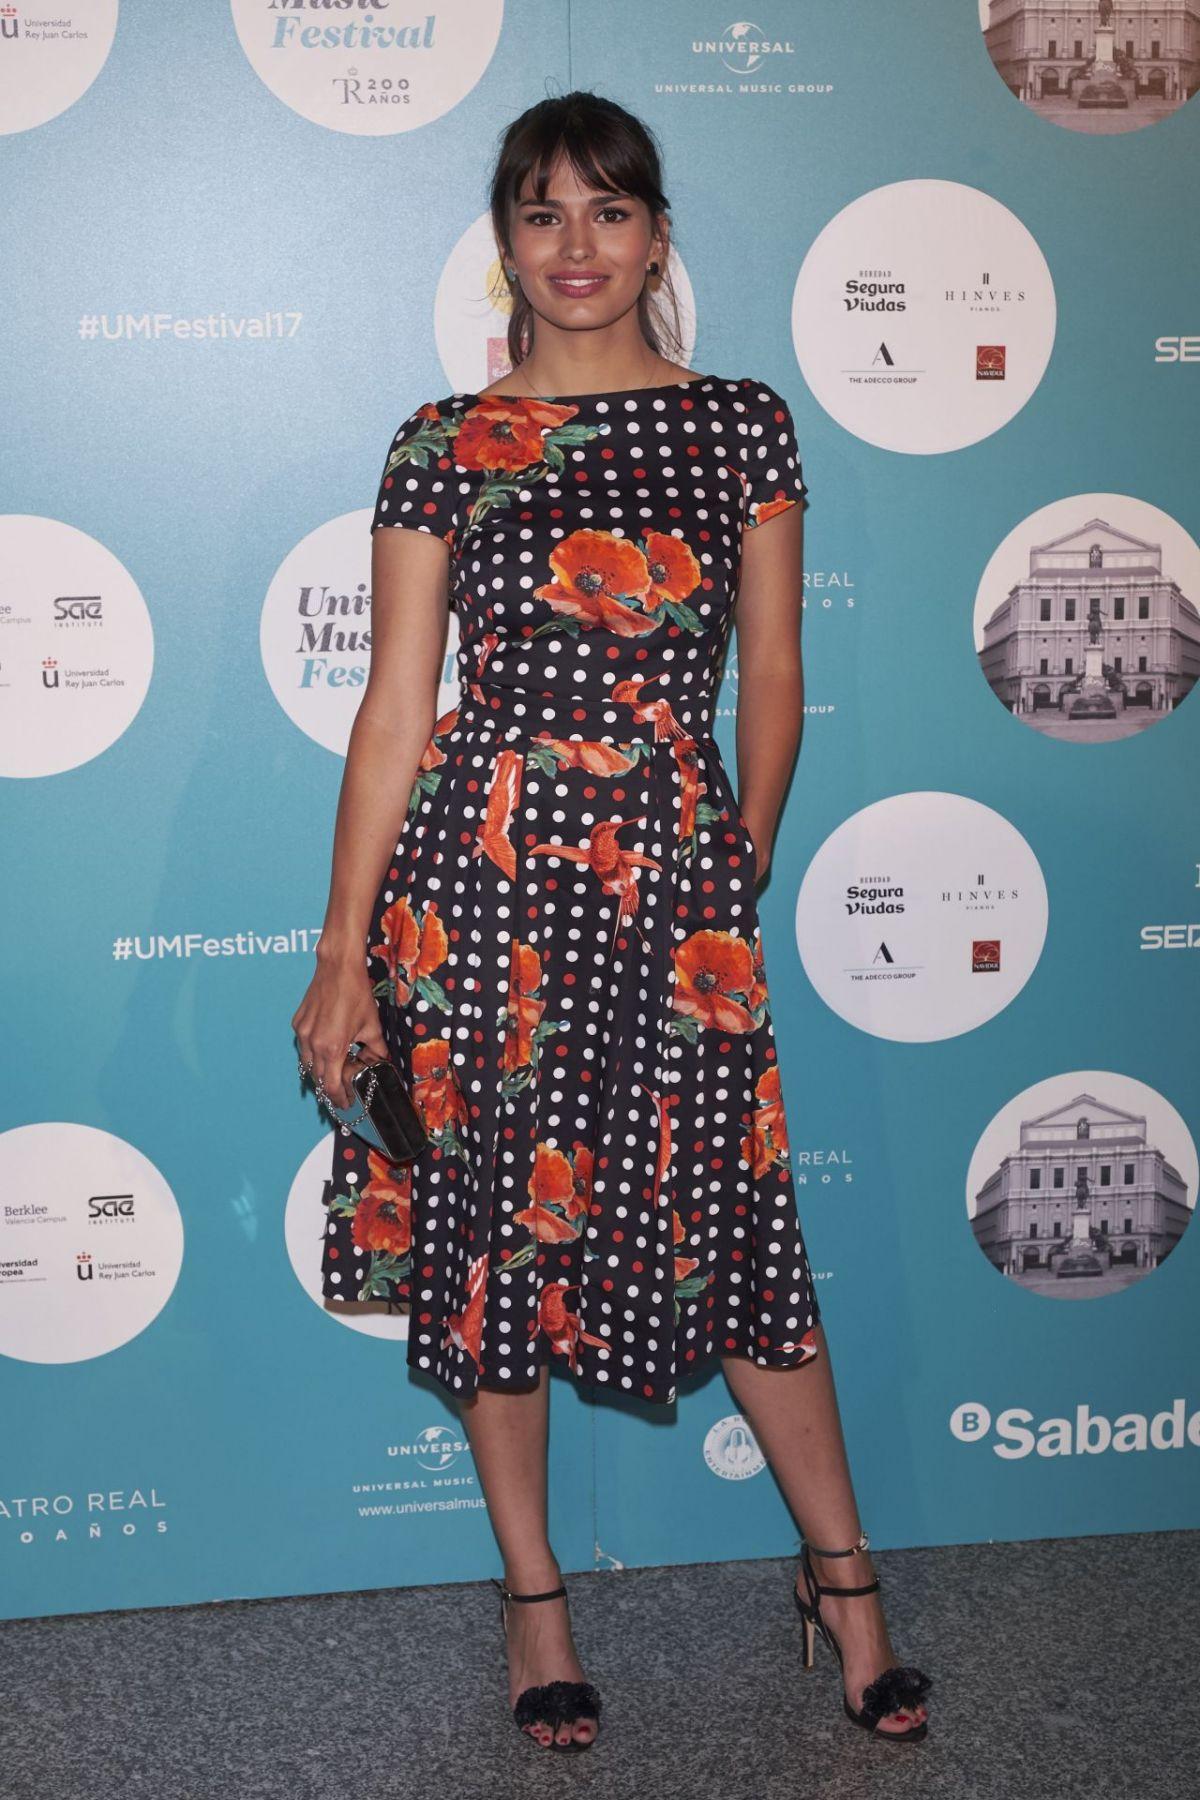 SARA SALAMO at Universal Music Festival in Madrid 07/28/2017